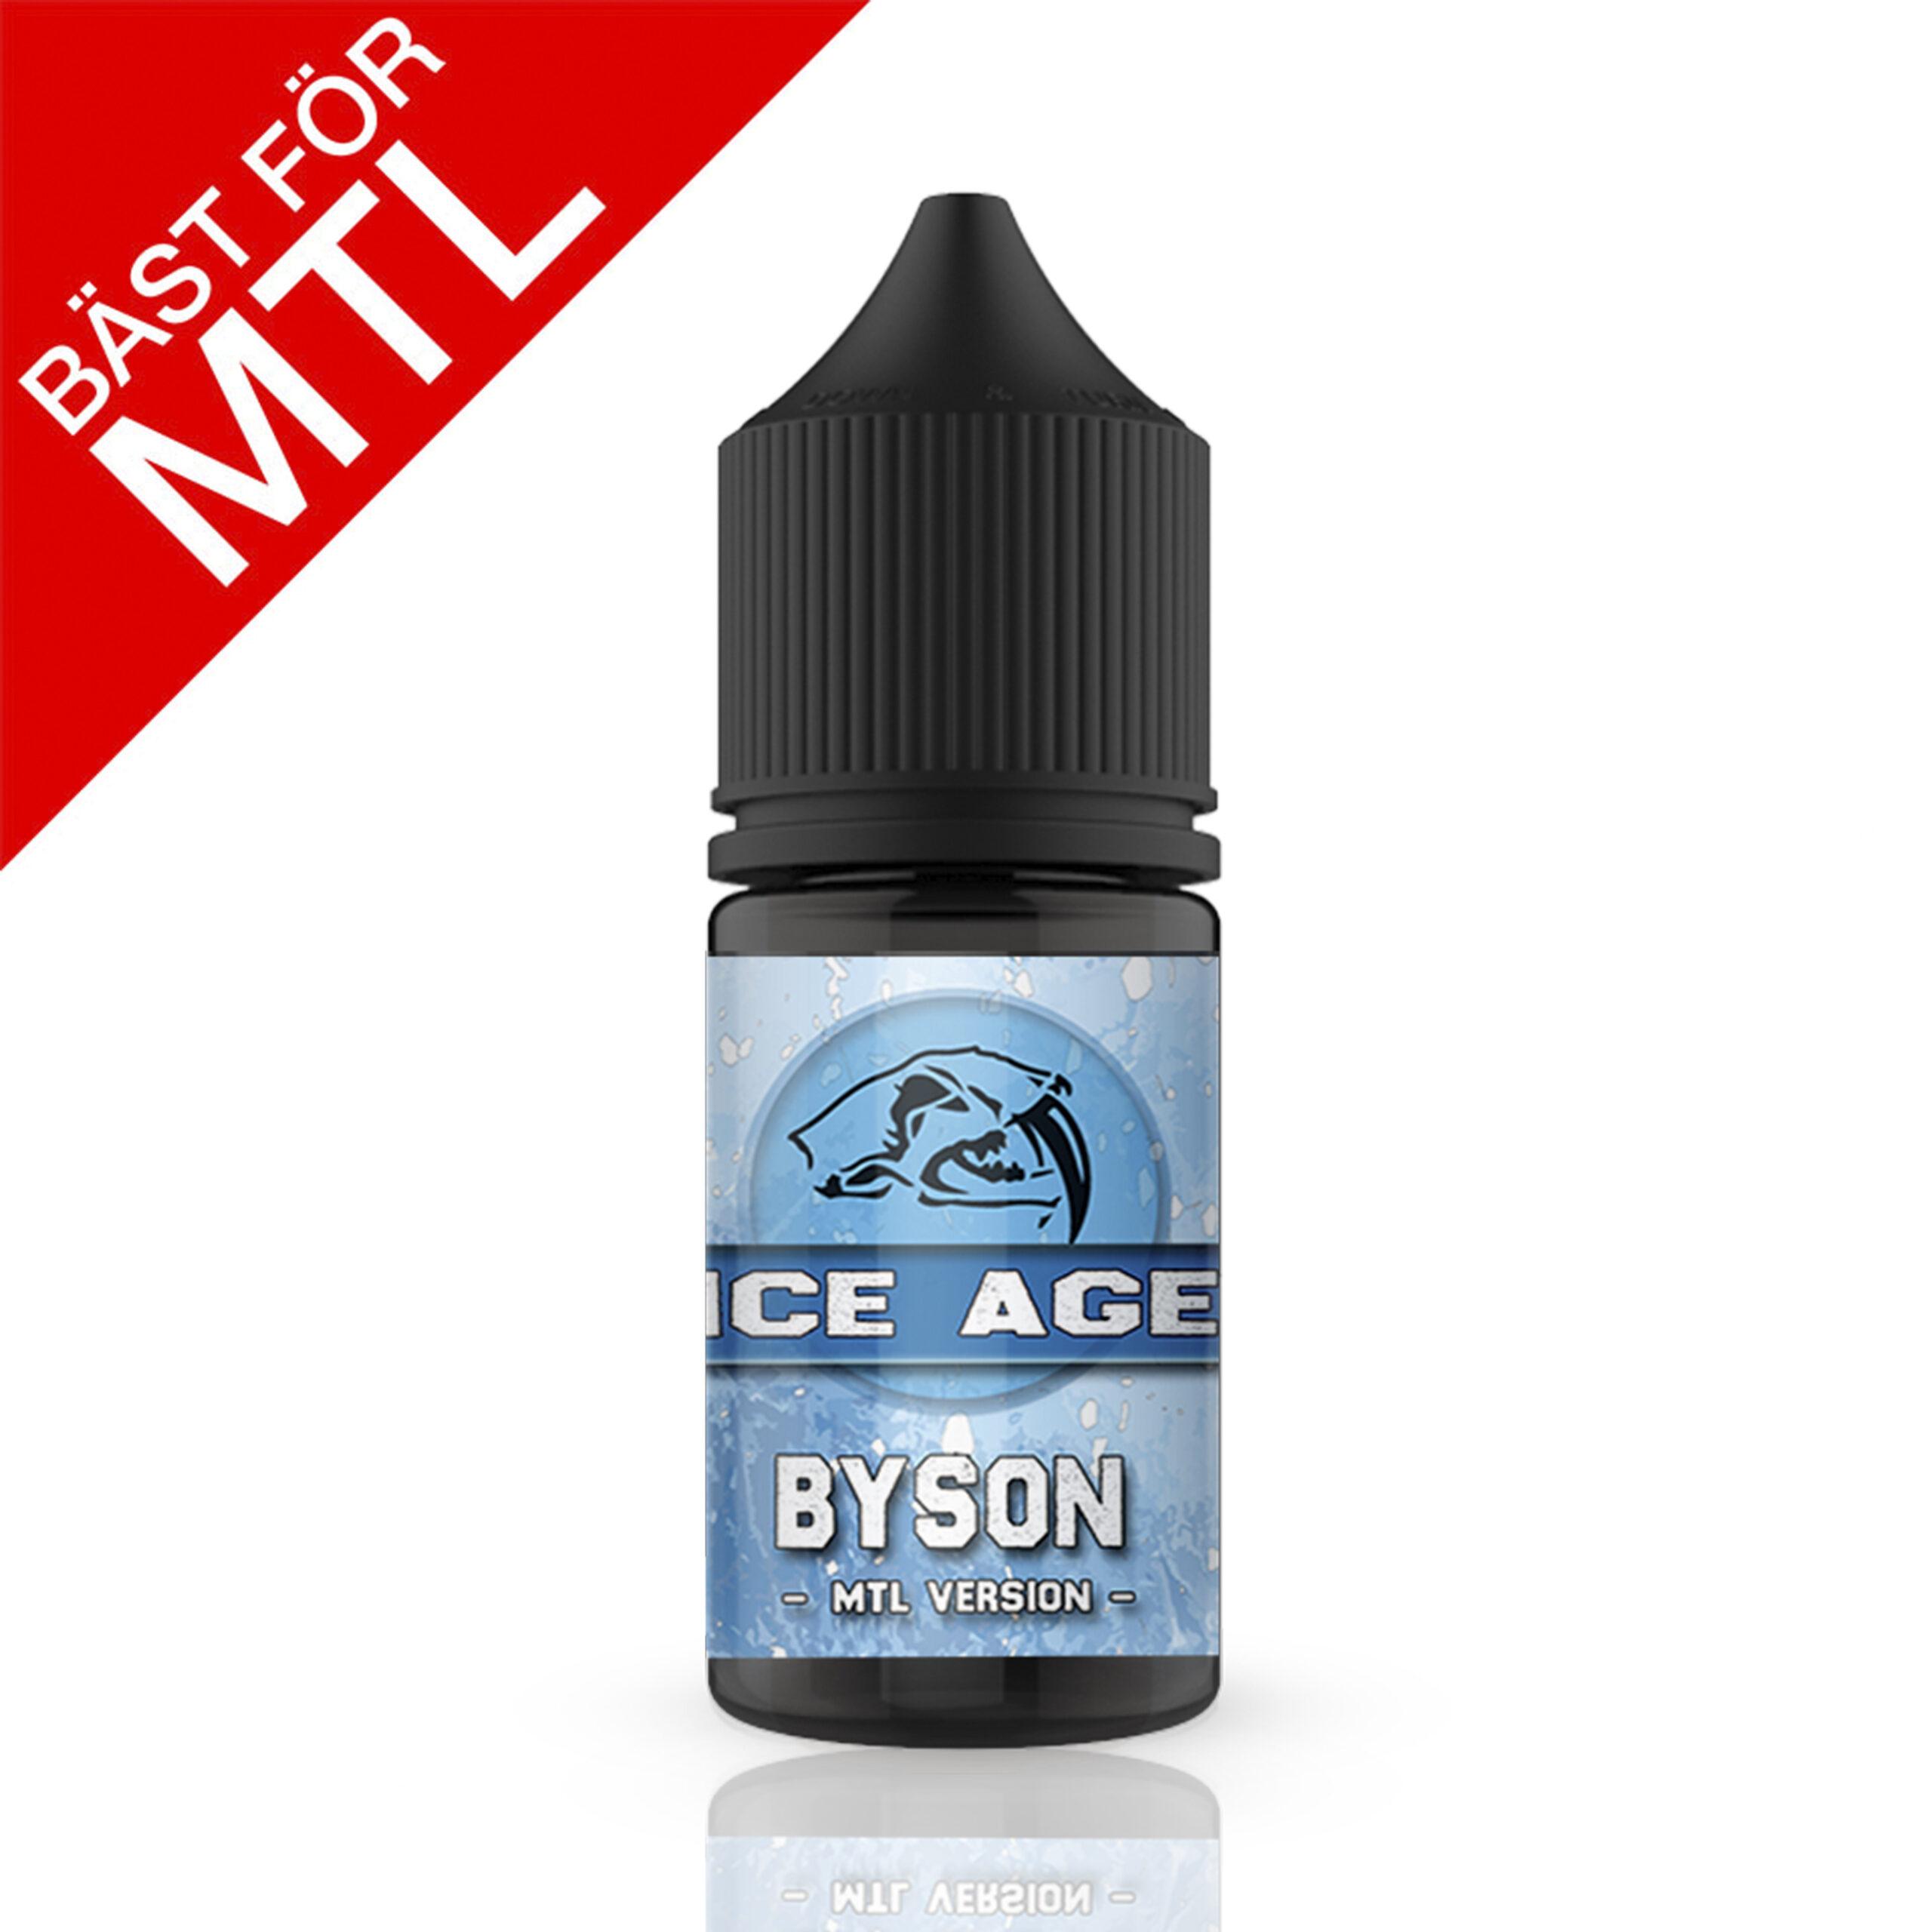 Ice Age - Byson (MTL Version) (Shortfill)